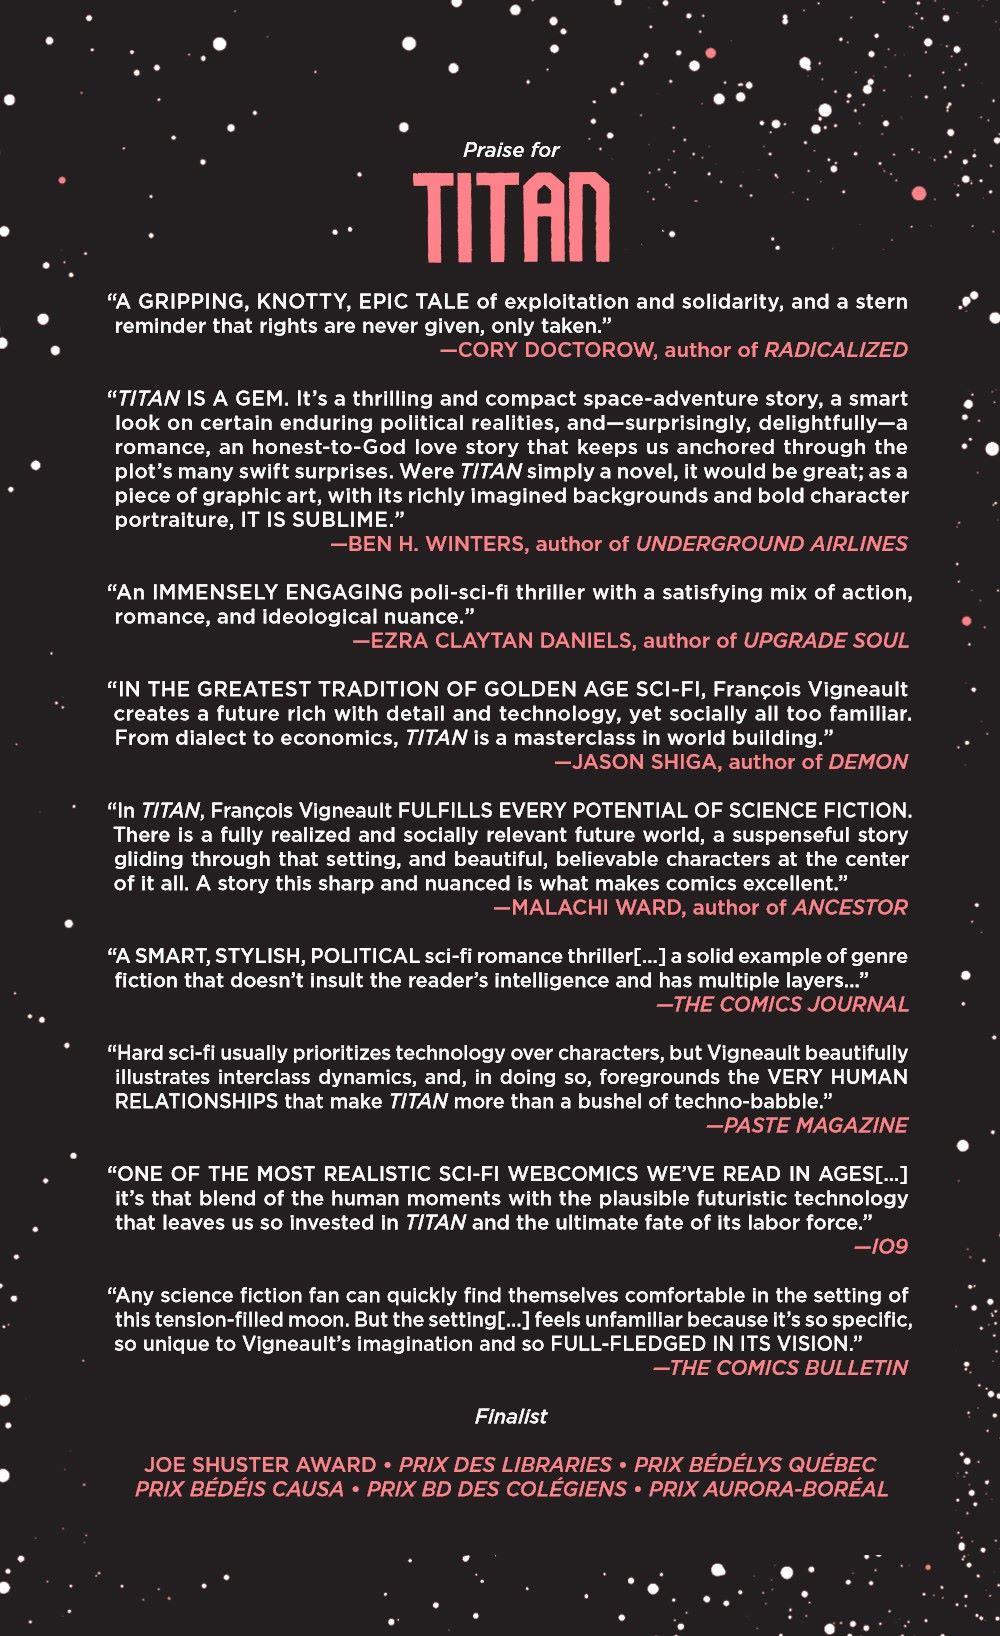 TITAN-REFERENCE-002 ComicList Previews: TITAN GN